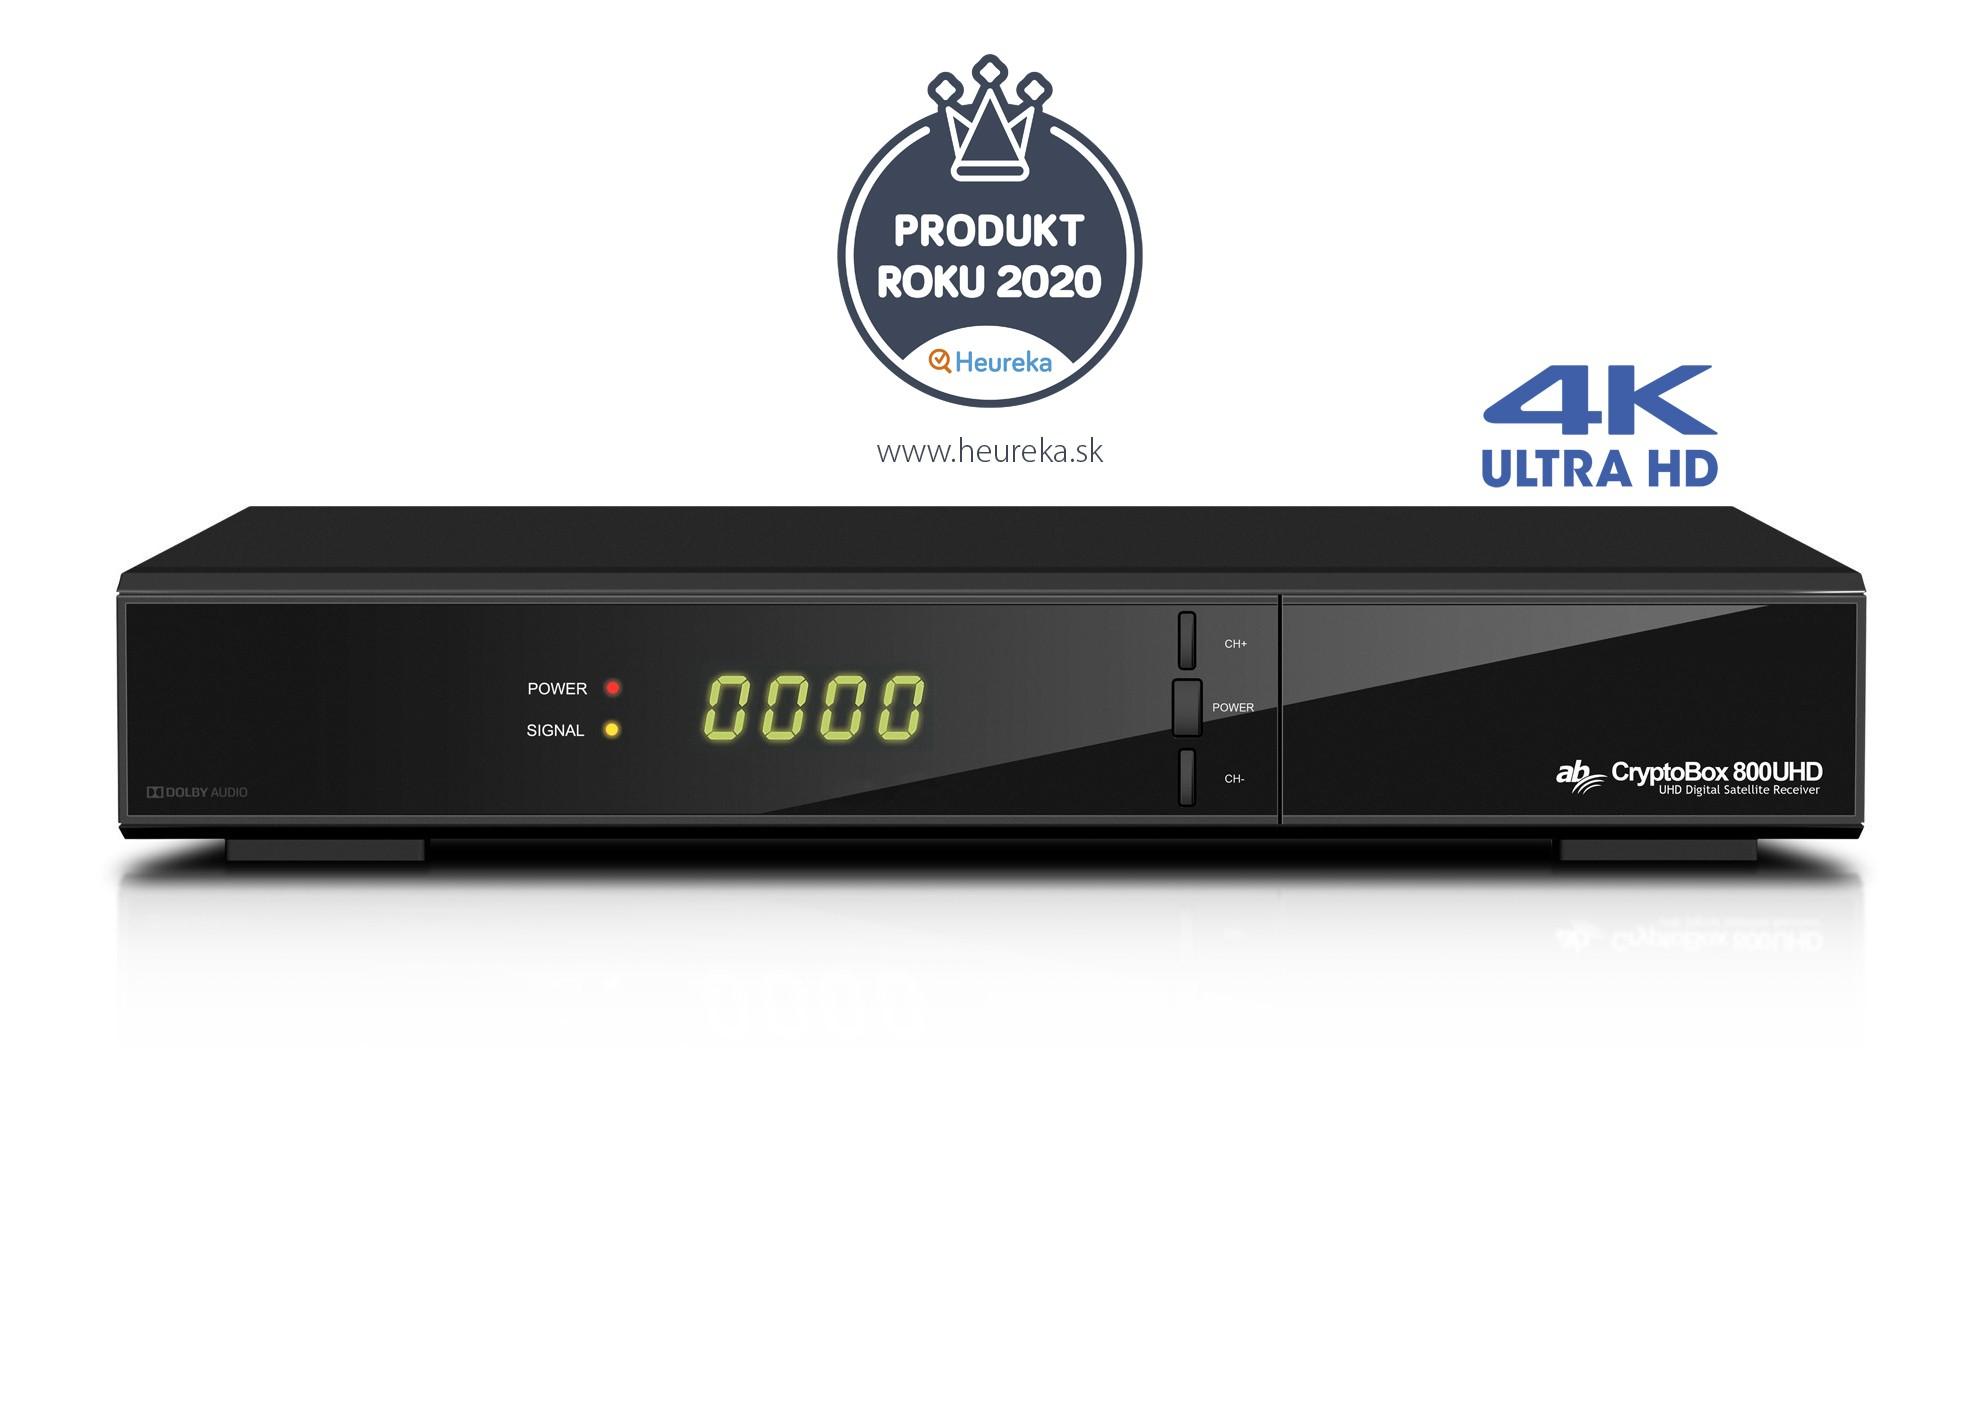 AB CryptoBox 800UHD 2160p DVB-S2X H.265 CA USB LAN Sat Receiver